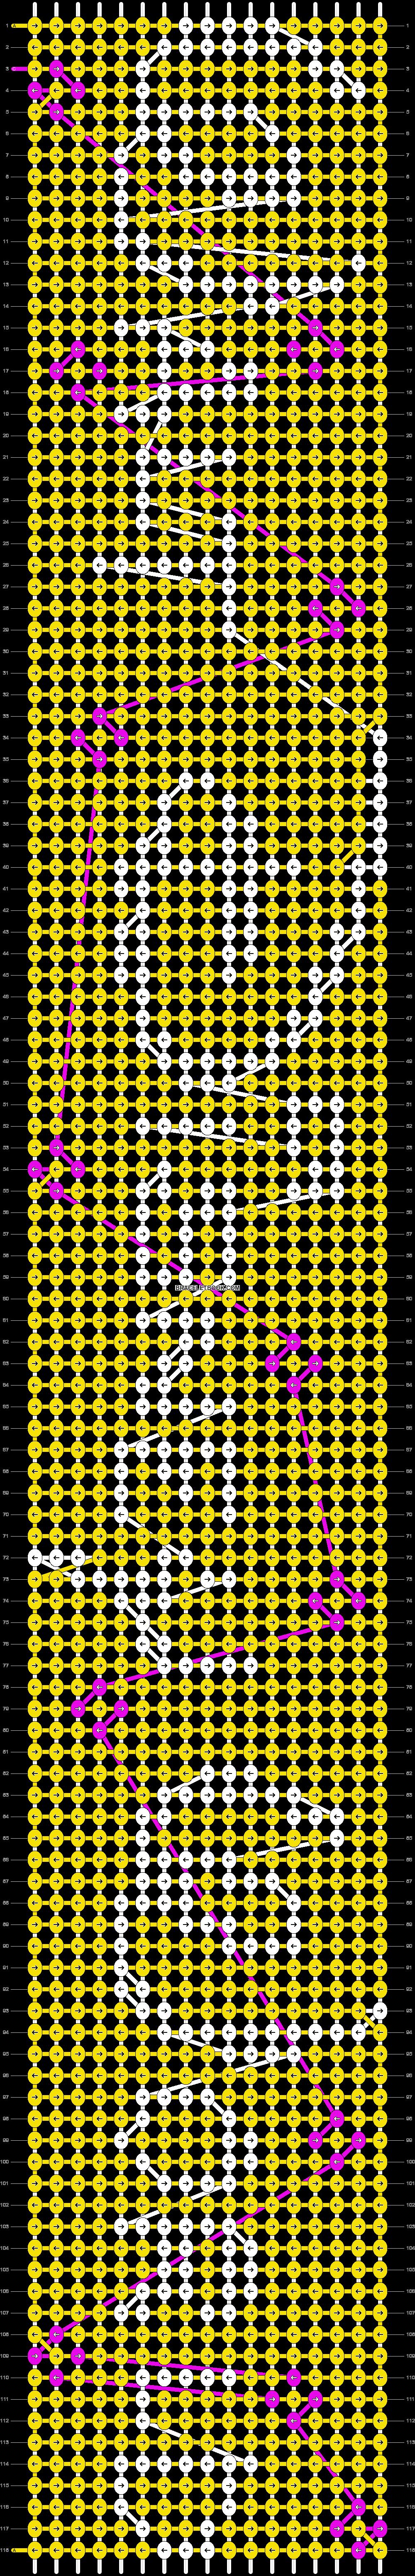 Alpha pattern #21092 pattern